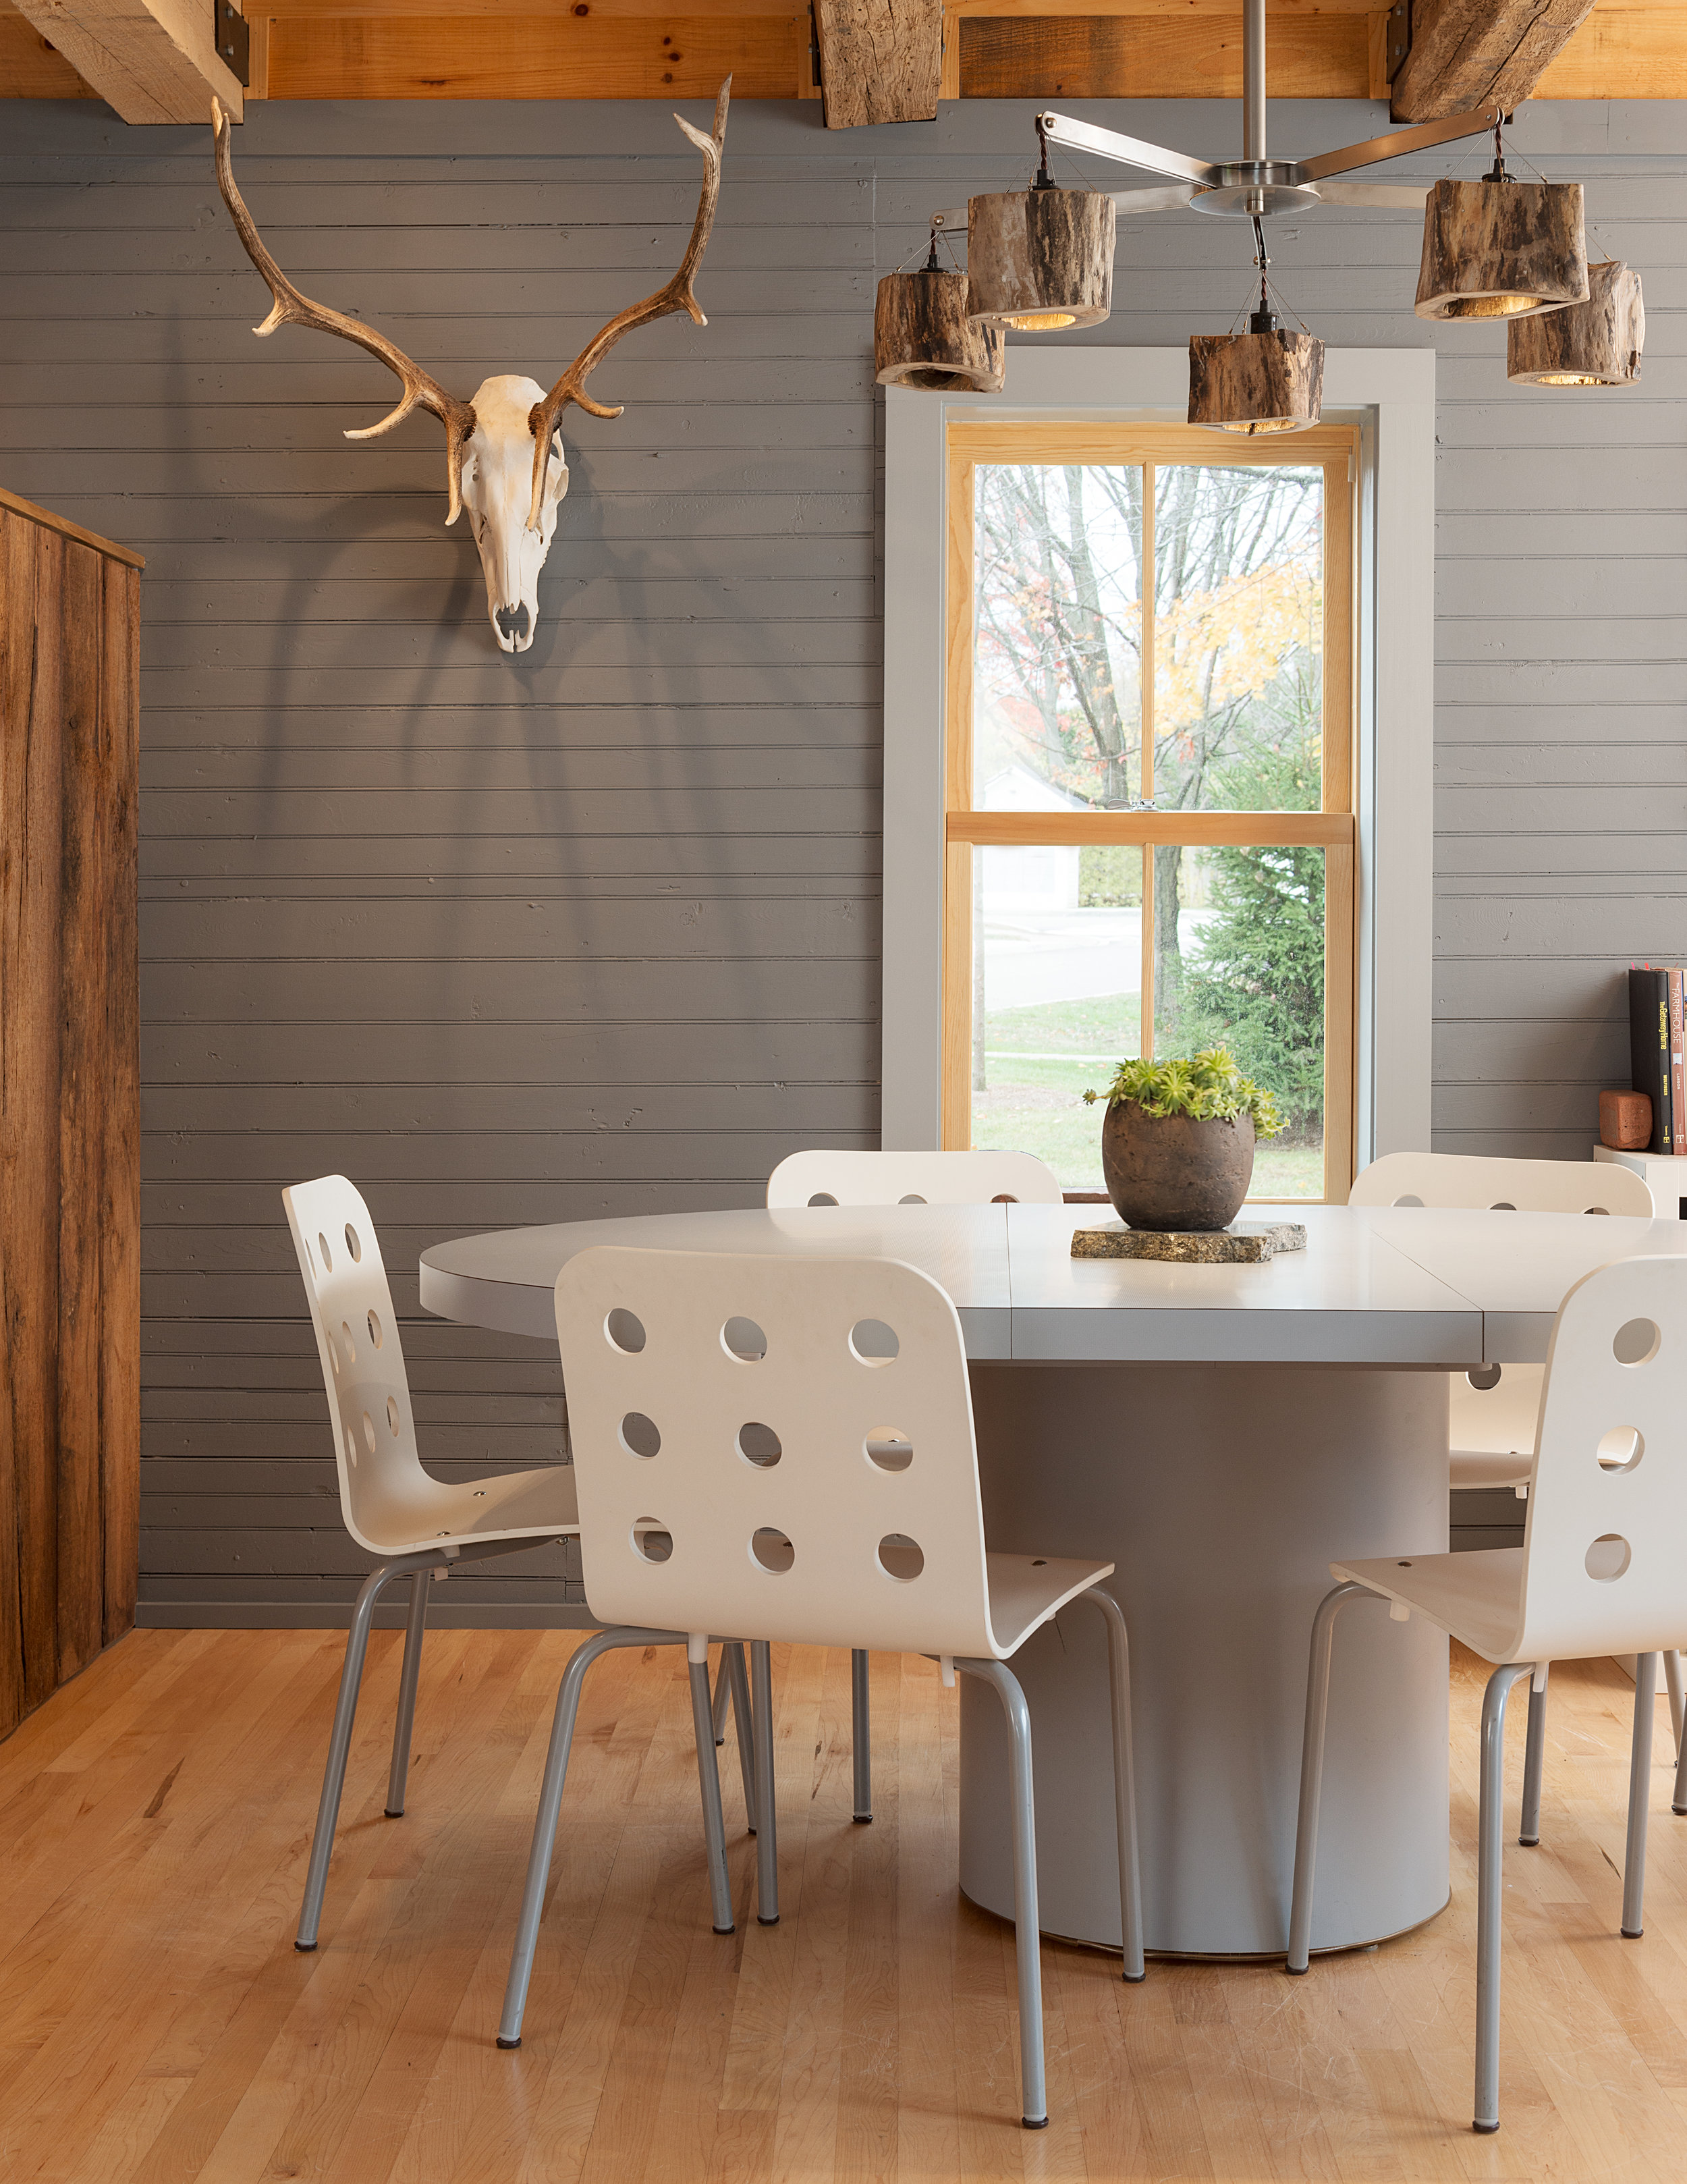 Interior Renovation | Modern Rustic